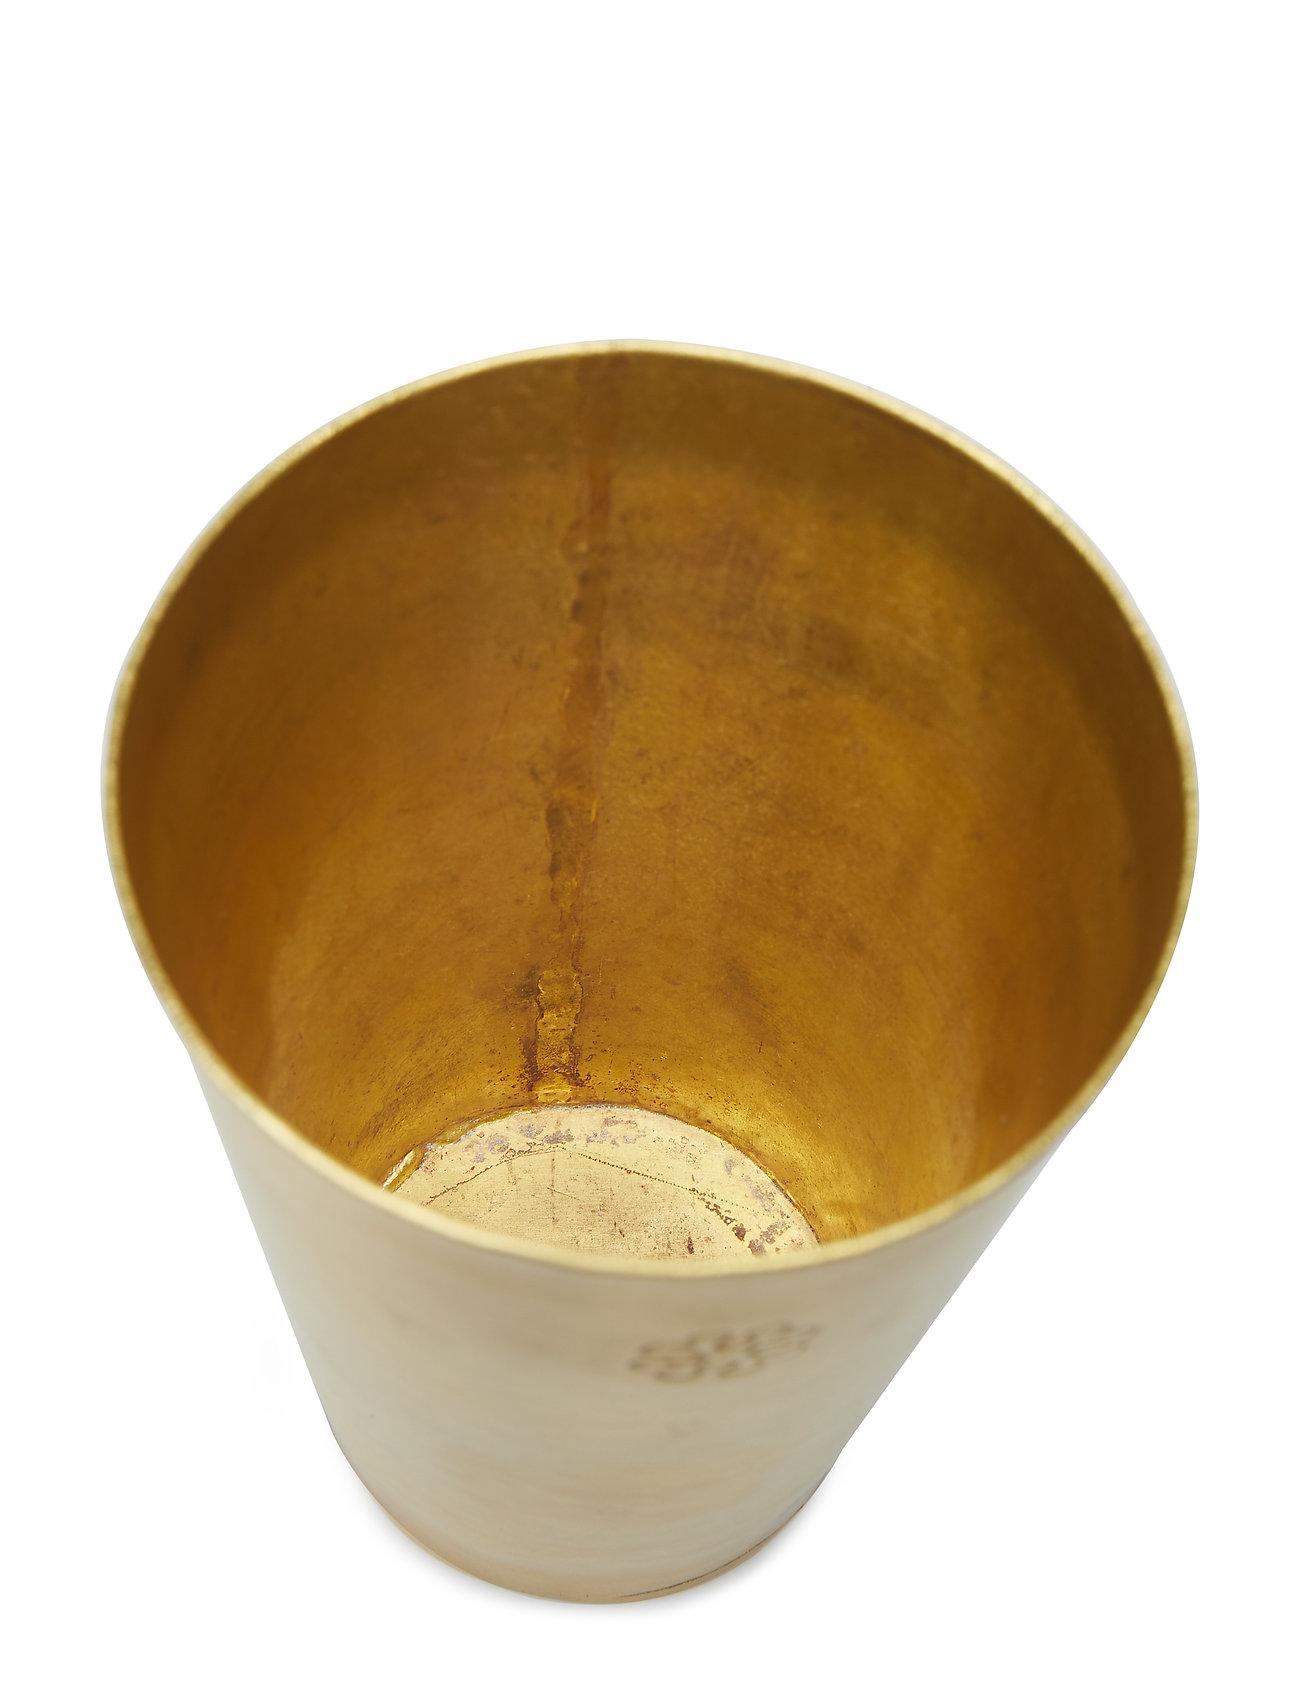 Carved GoldenbrassDay Lassi Lassi Vase Vase Carved GoldenbrassDay Home dCxohBtsQr